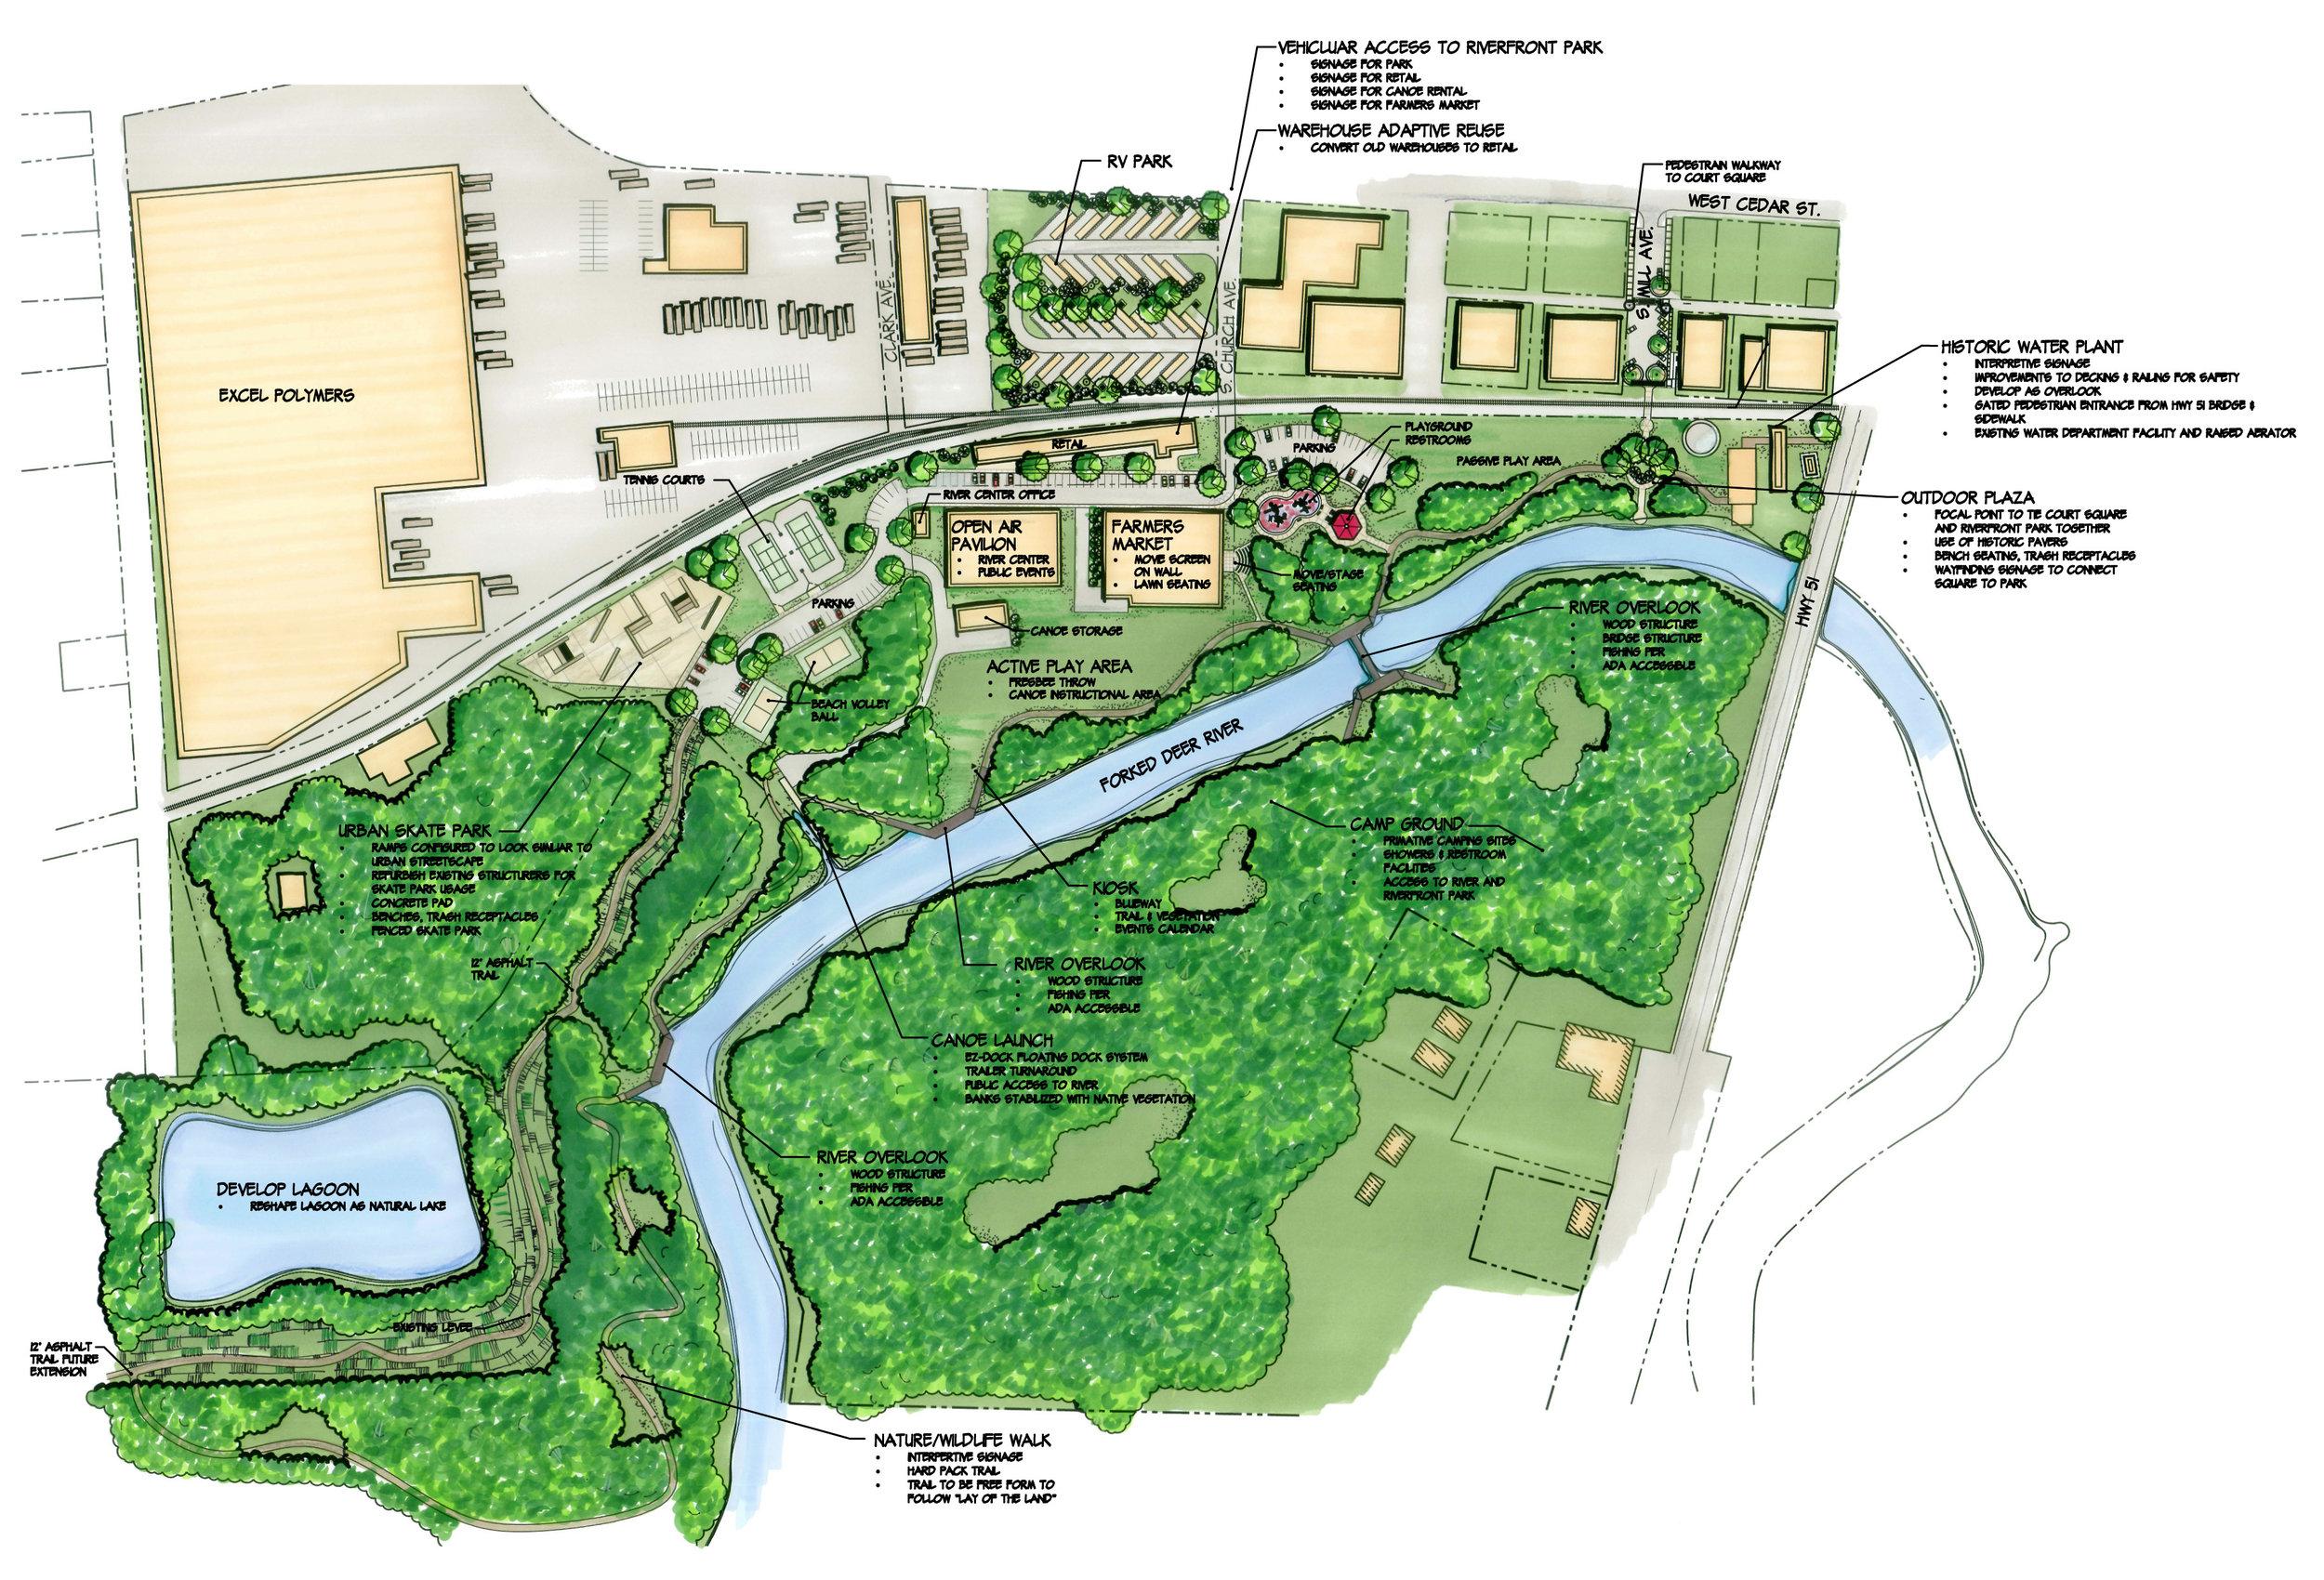 Dyersburg Riverfront Park Master Plan